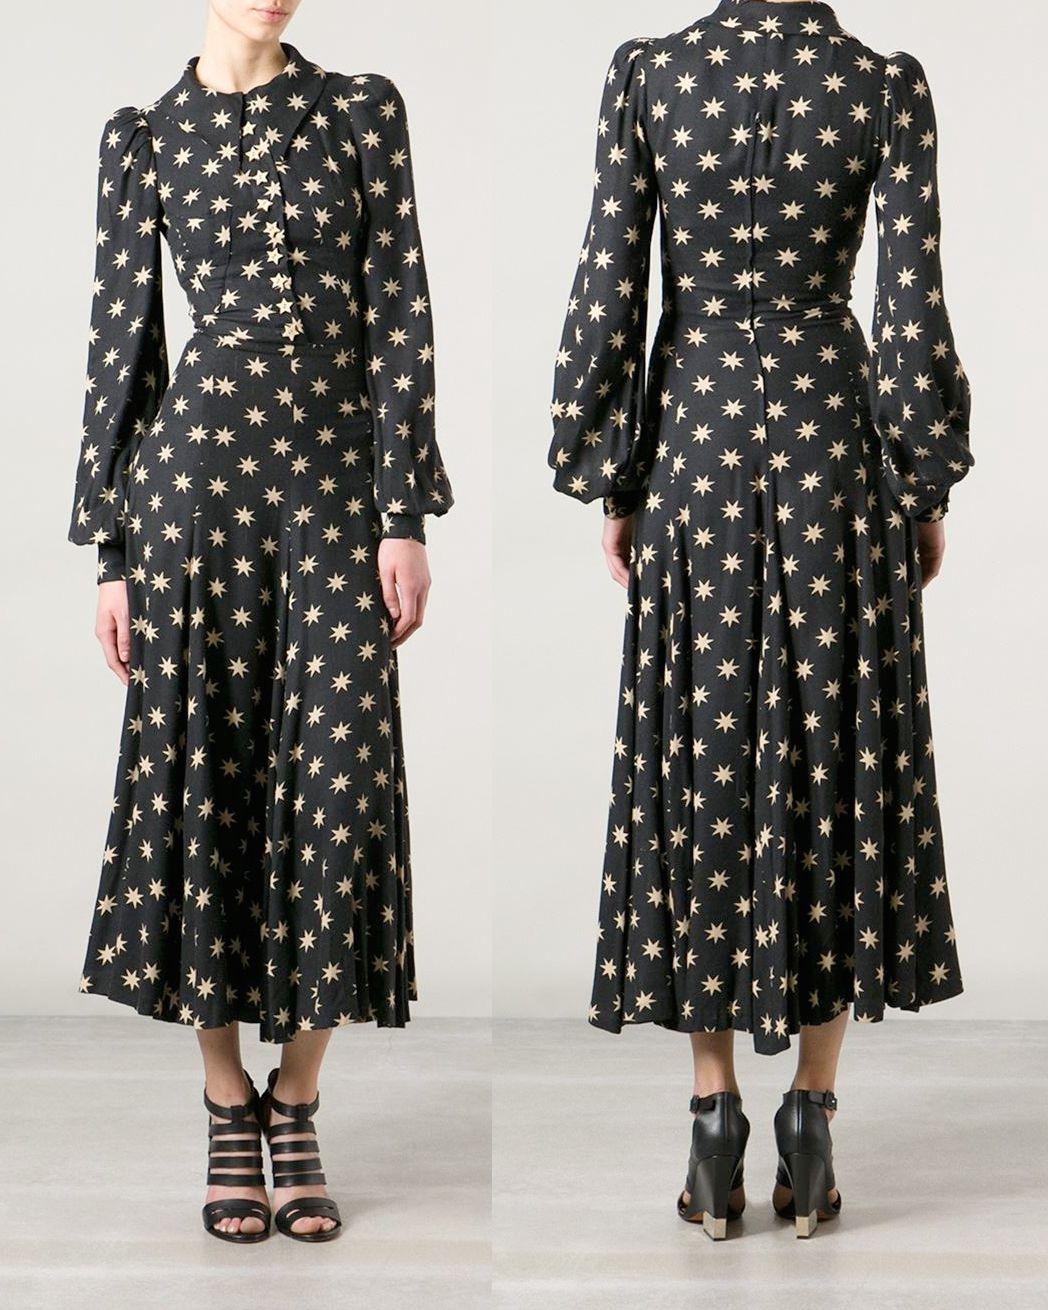 c7212462a7 Vintage Biba Star Print Dress. http   www.farfetch.com